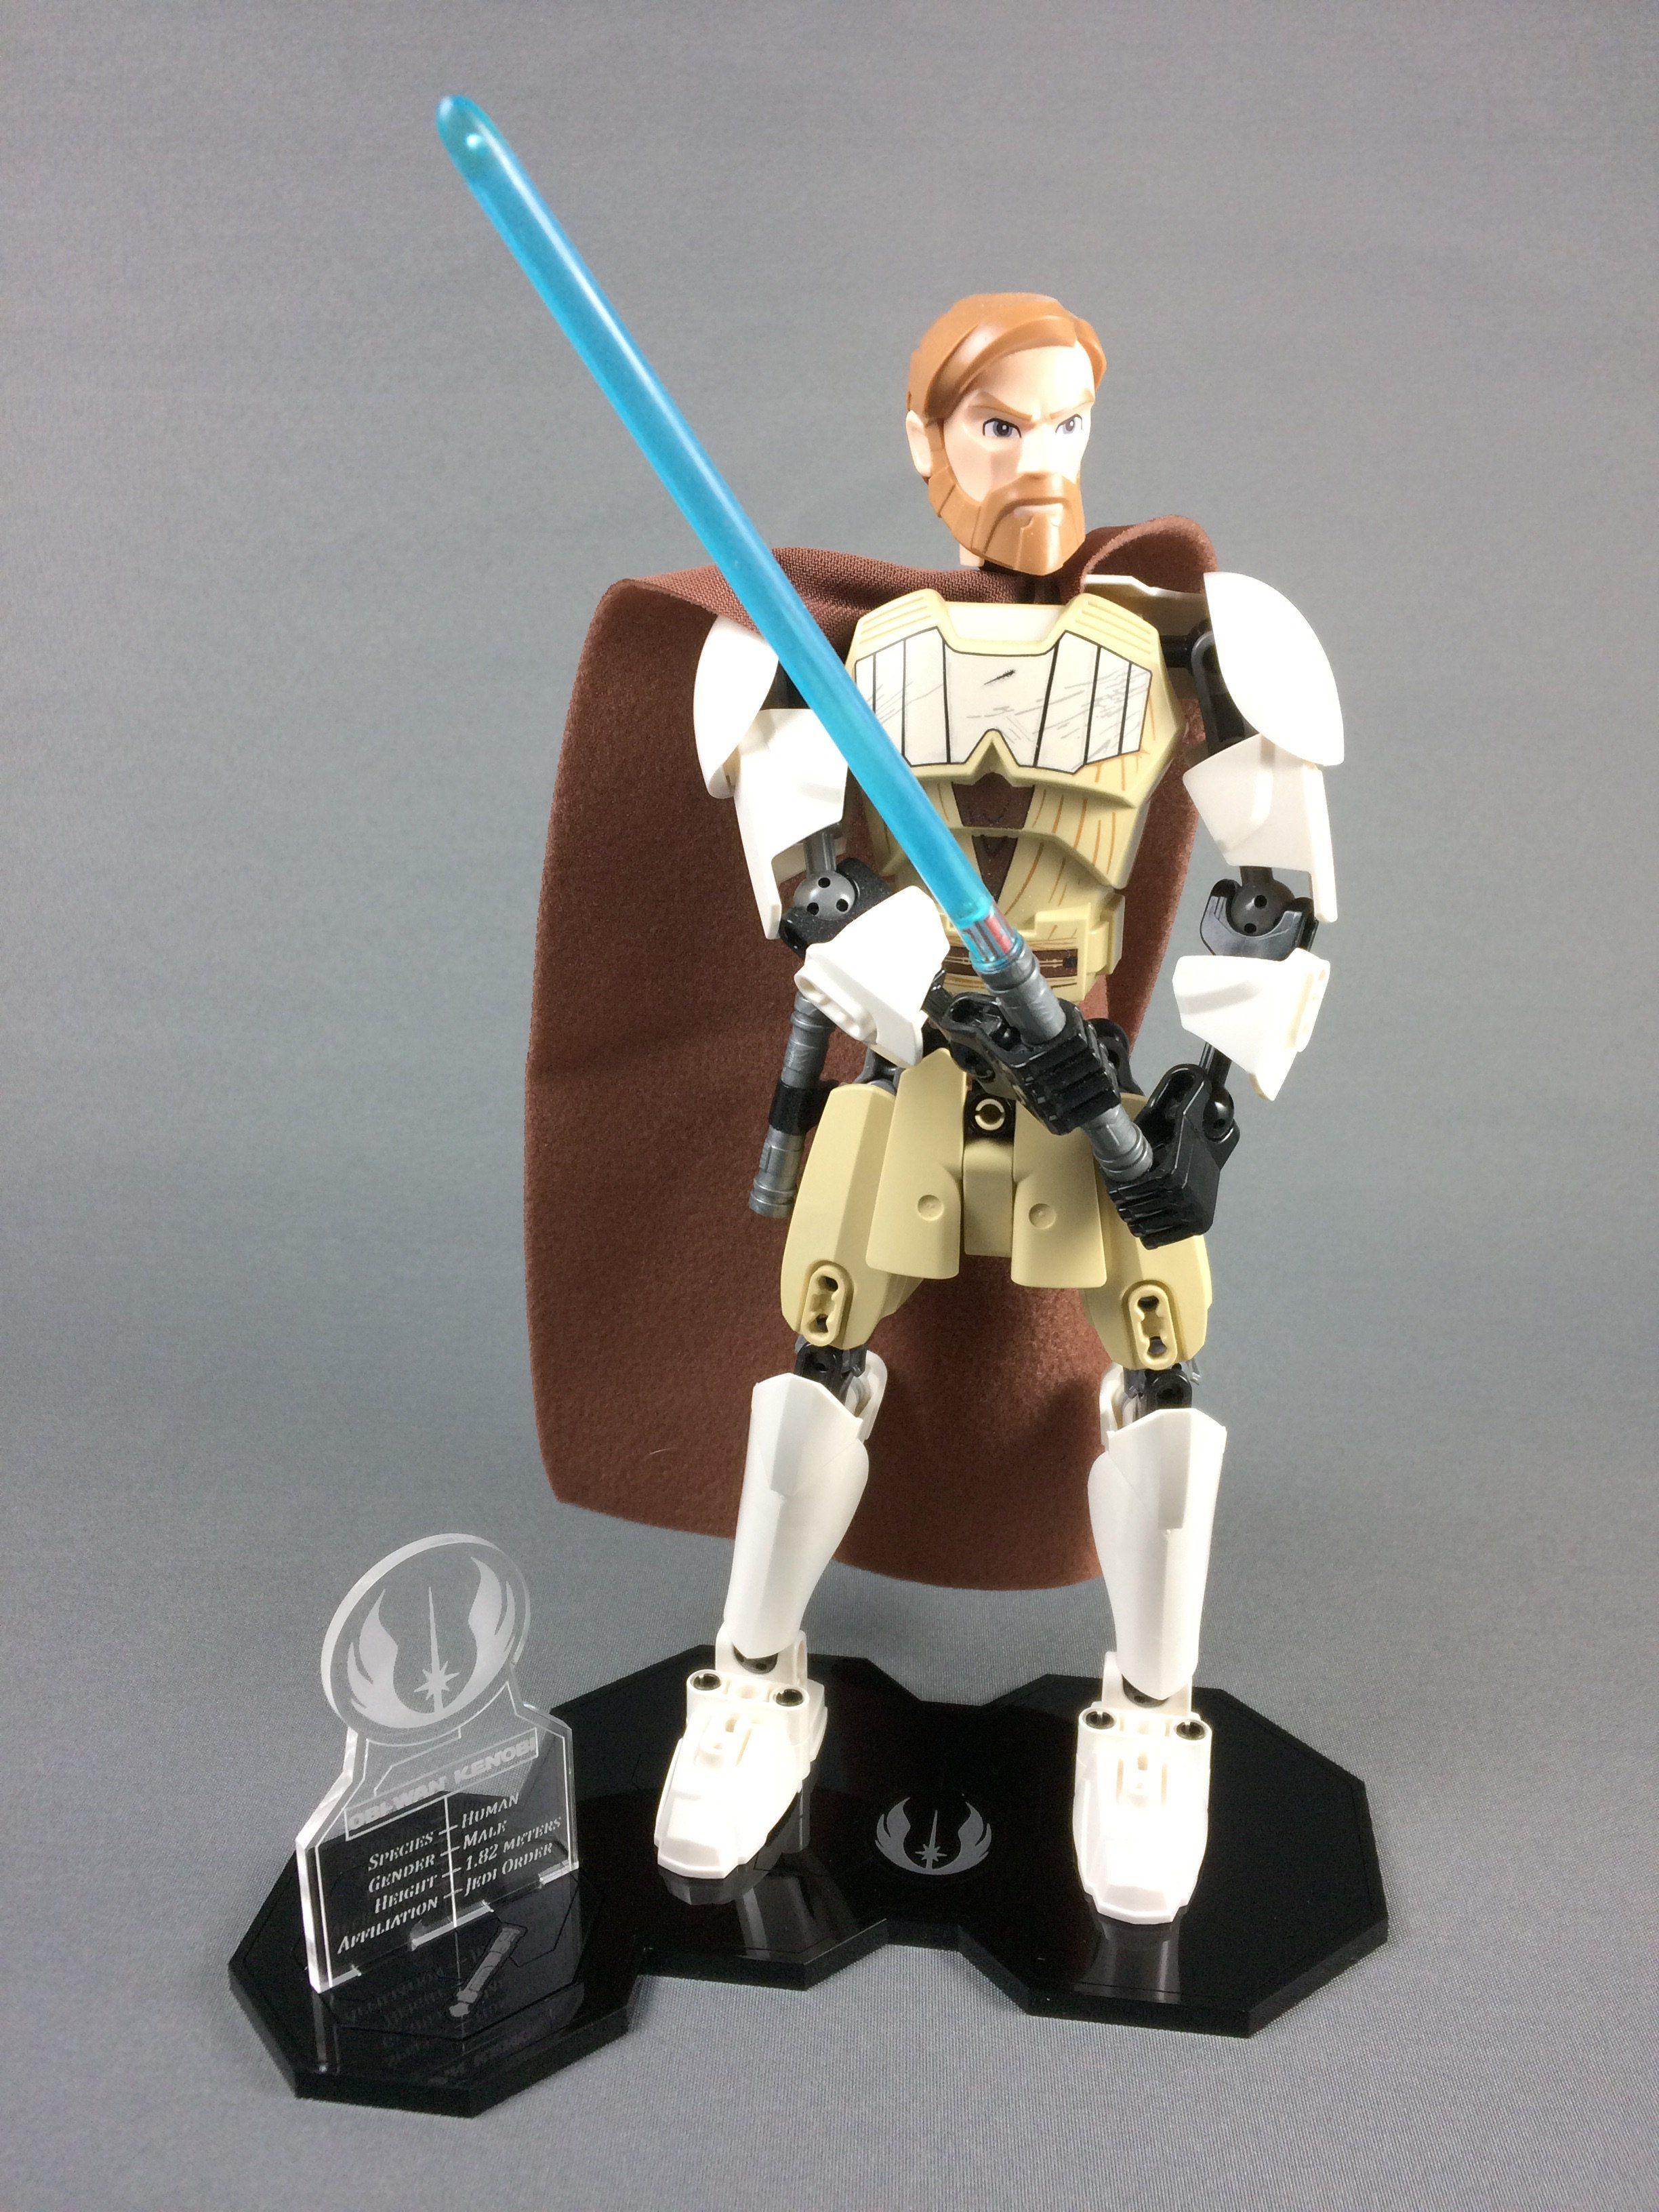 LEGO Obi-Wan Kenobi Star Wars Buildable Figure HEAD ONLY